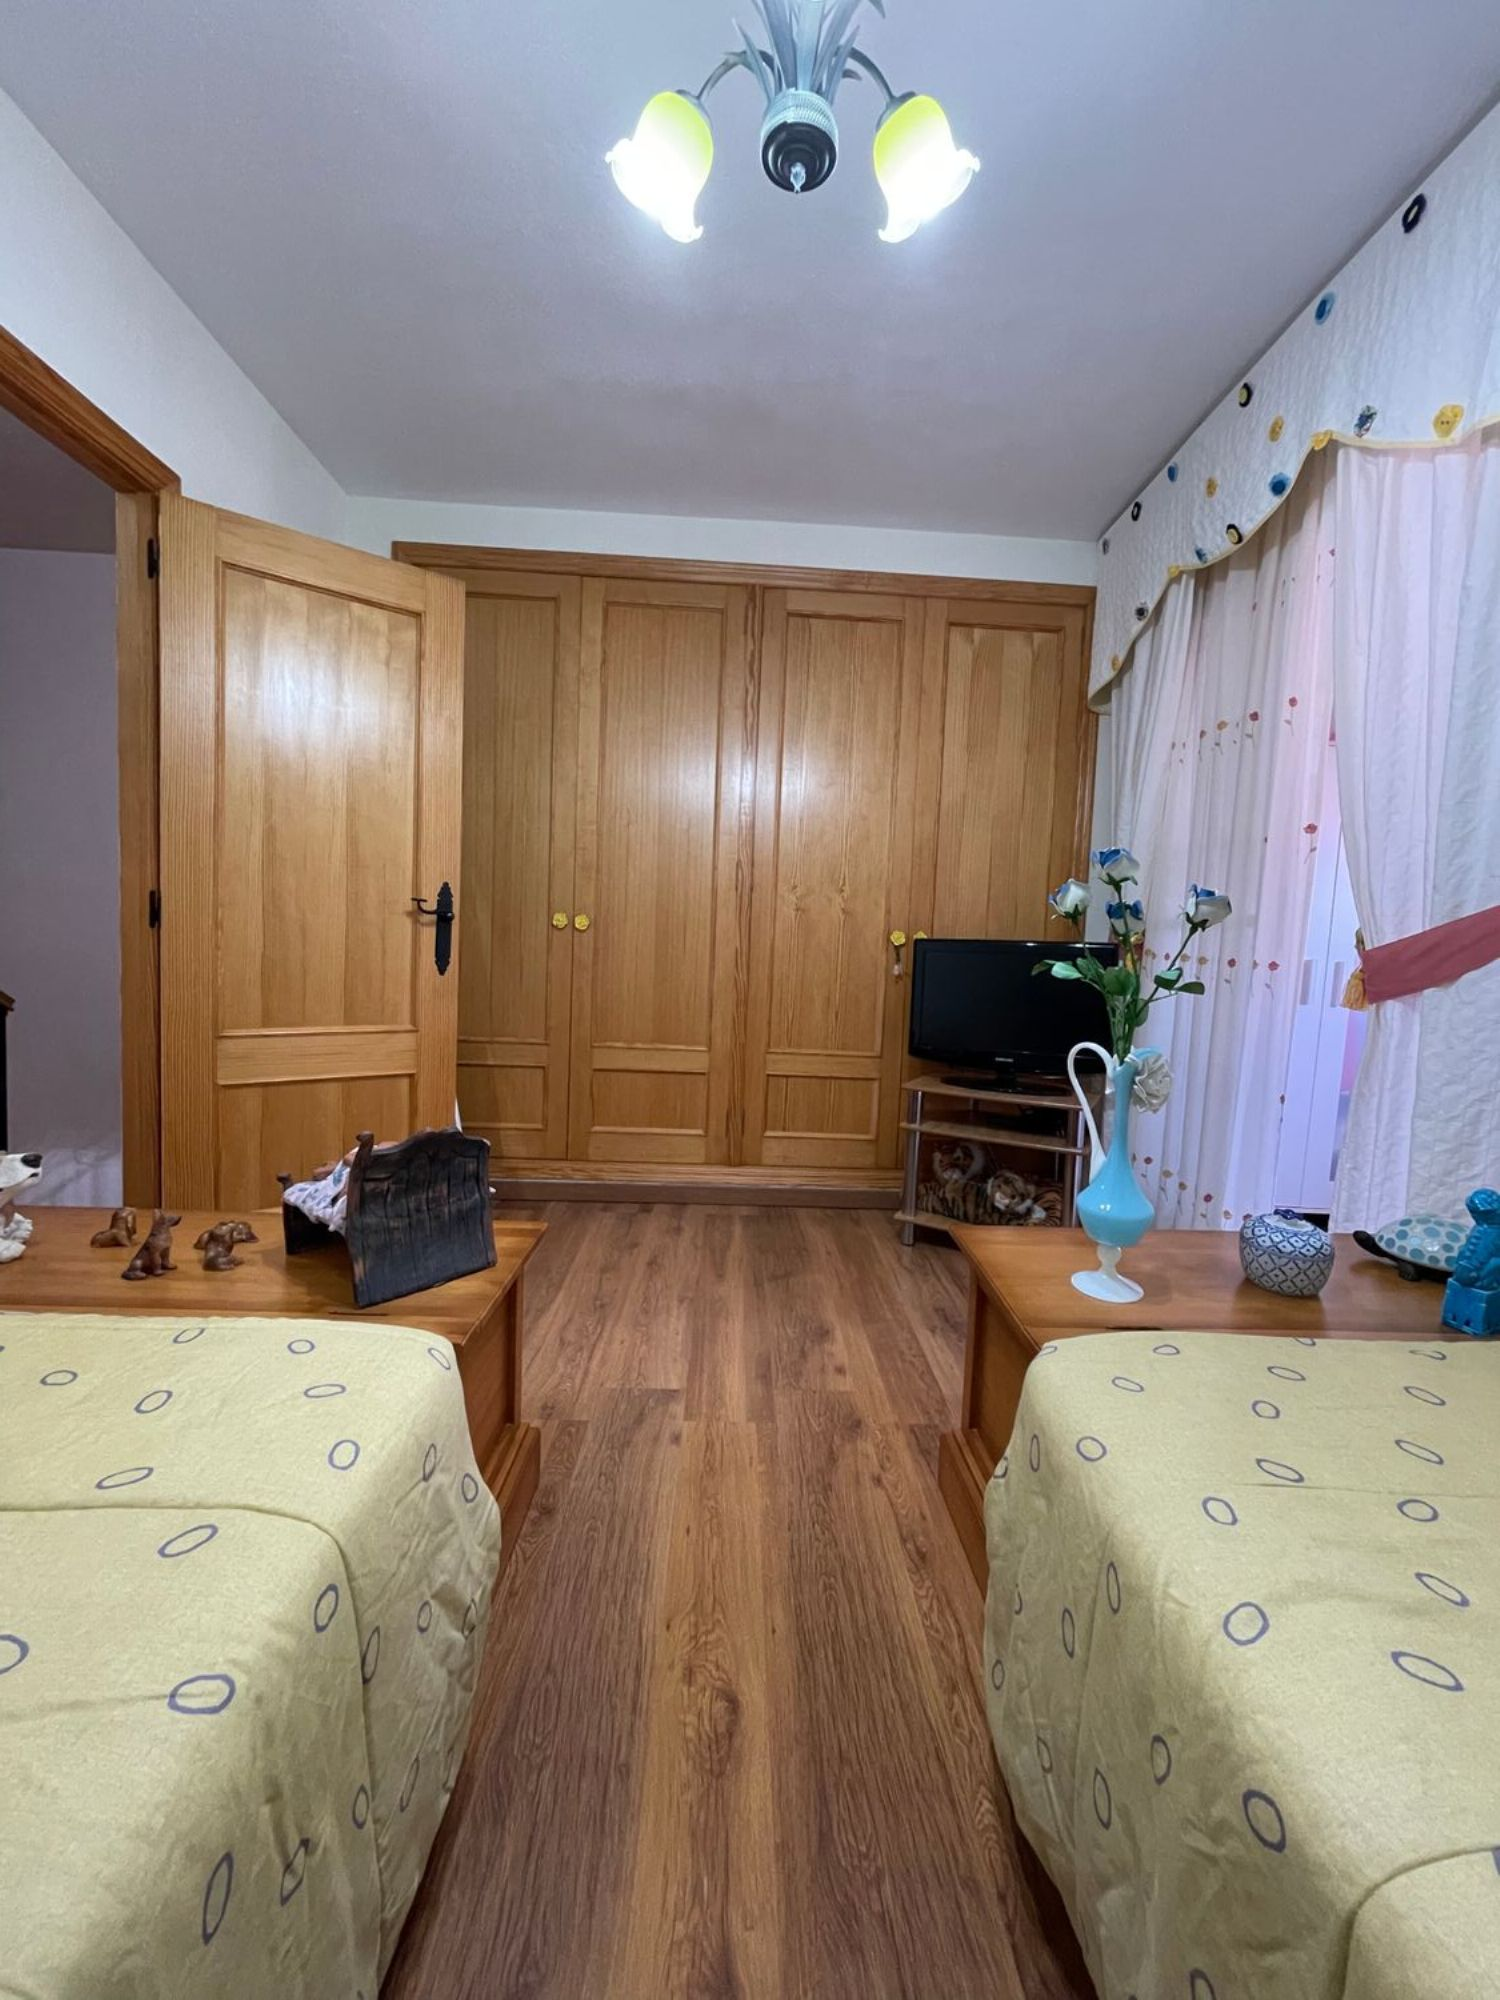 Chalet adosado en venta, Monte Santa Pola, Gran Alacant